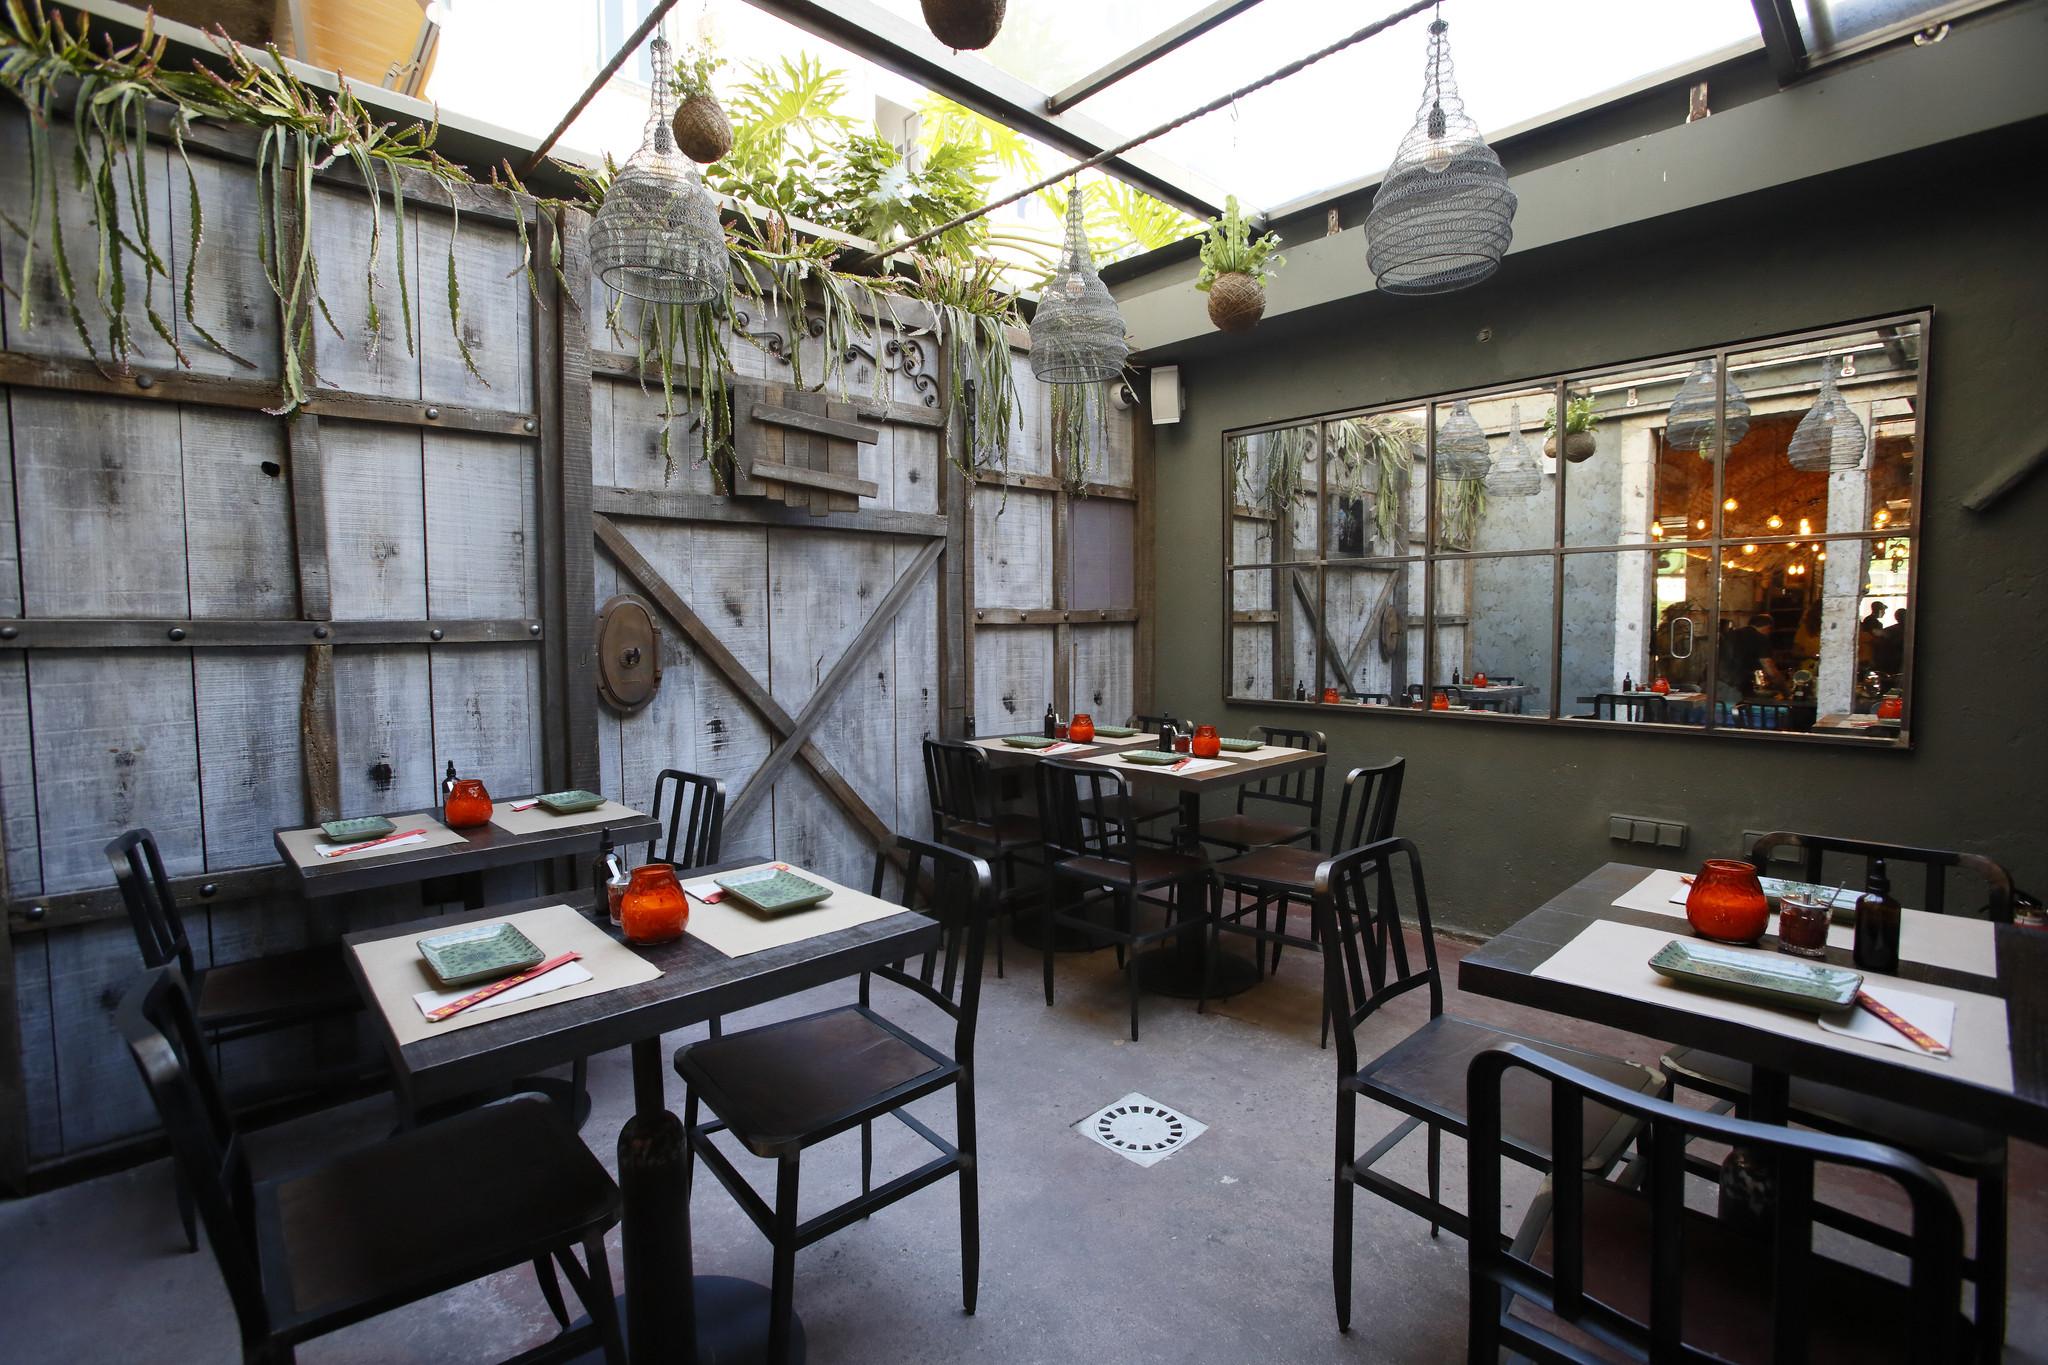 10908979MJ-Restaurante-Boa-Bao-07.JPG